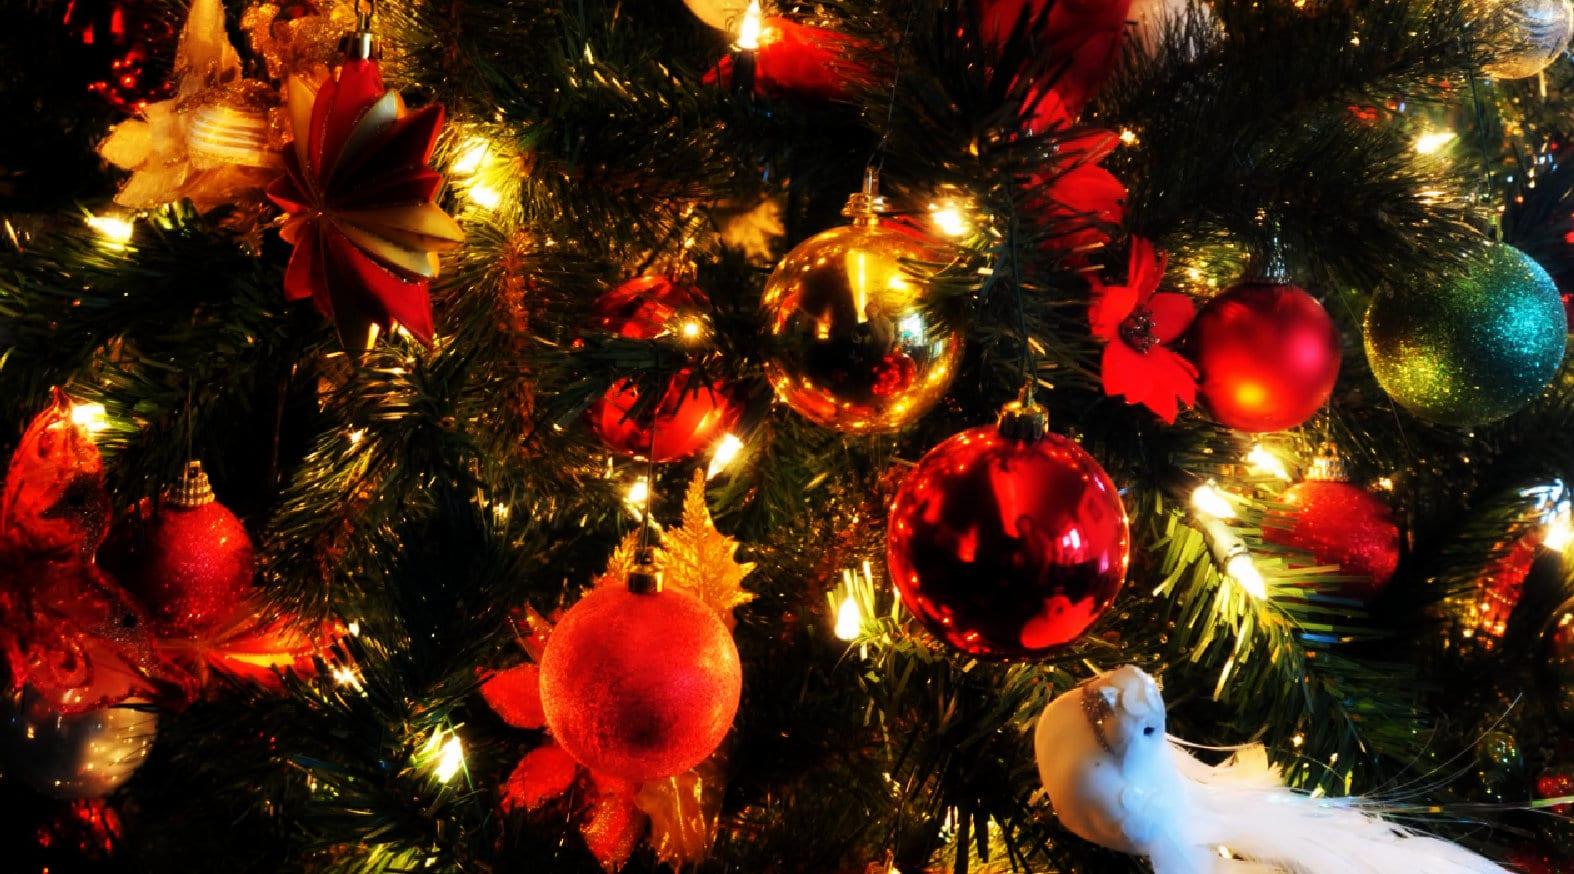 Merry Christmas ill.